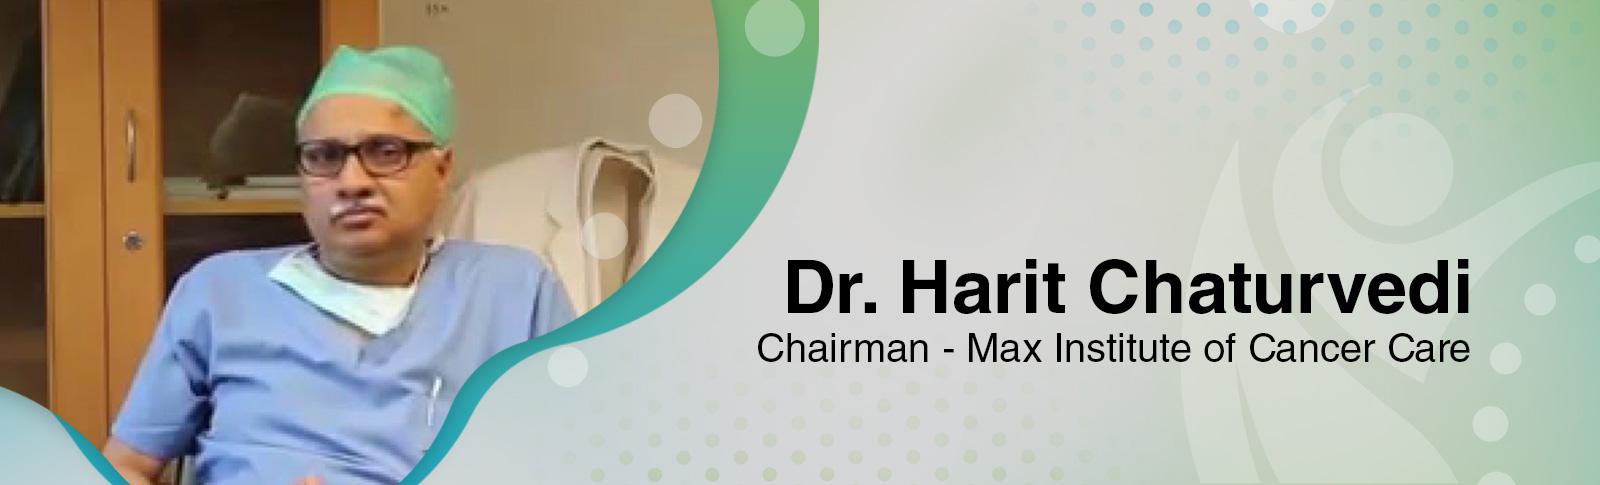 Dr Harit Chaturvedi